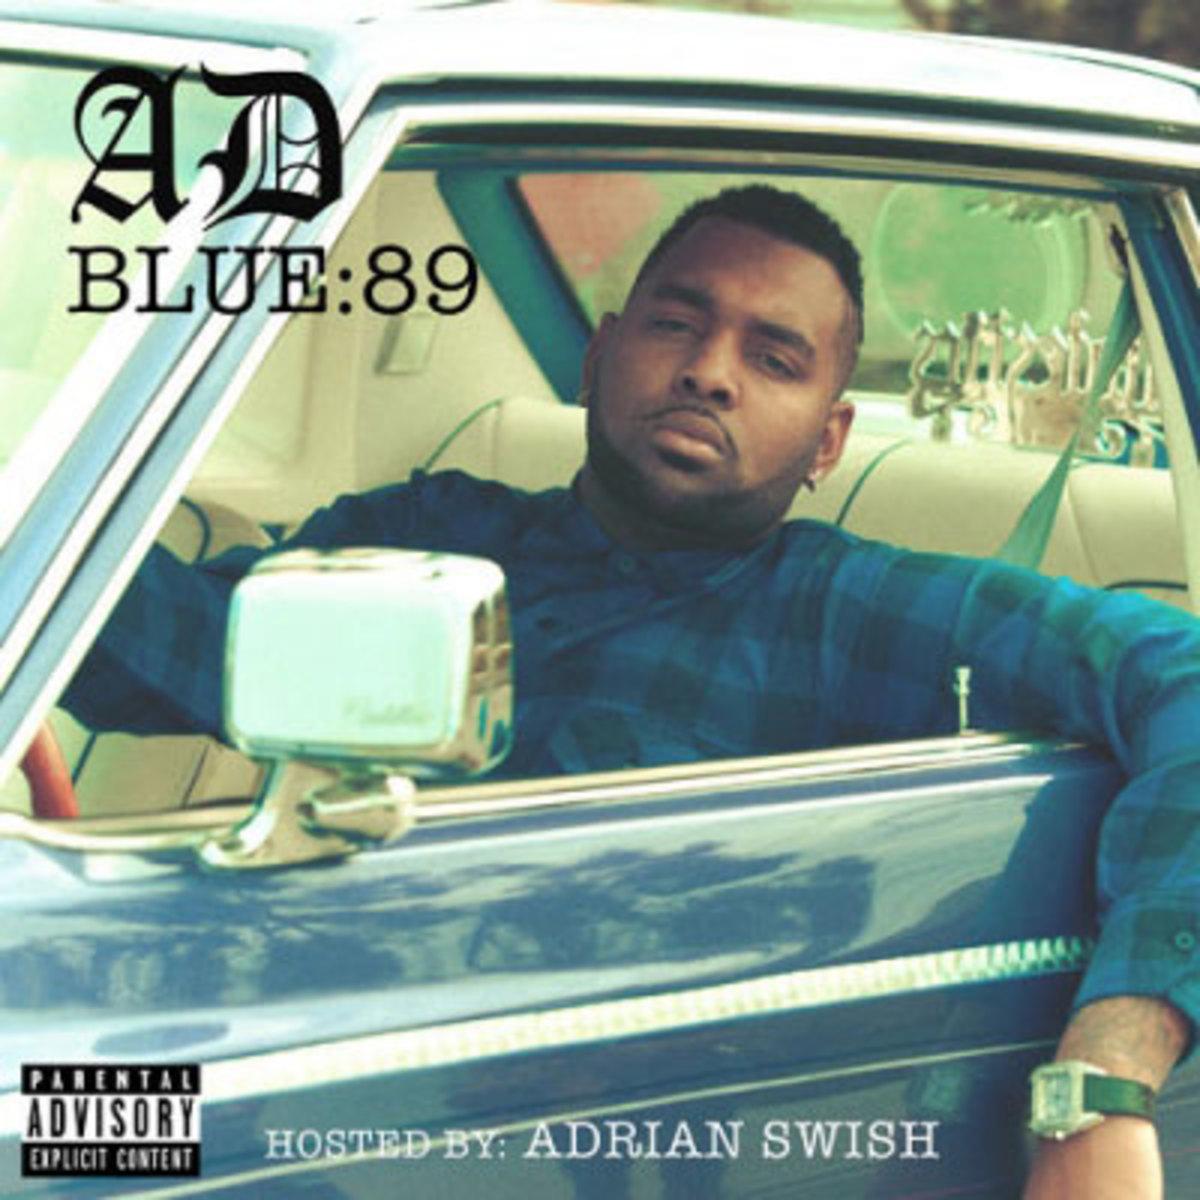 ad-blue-89.jpg